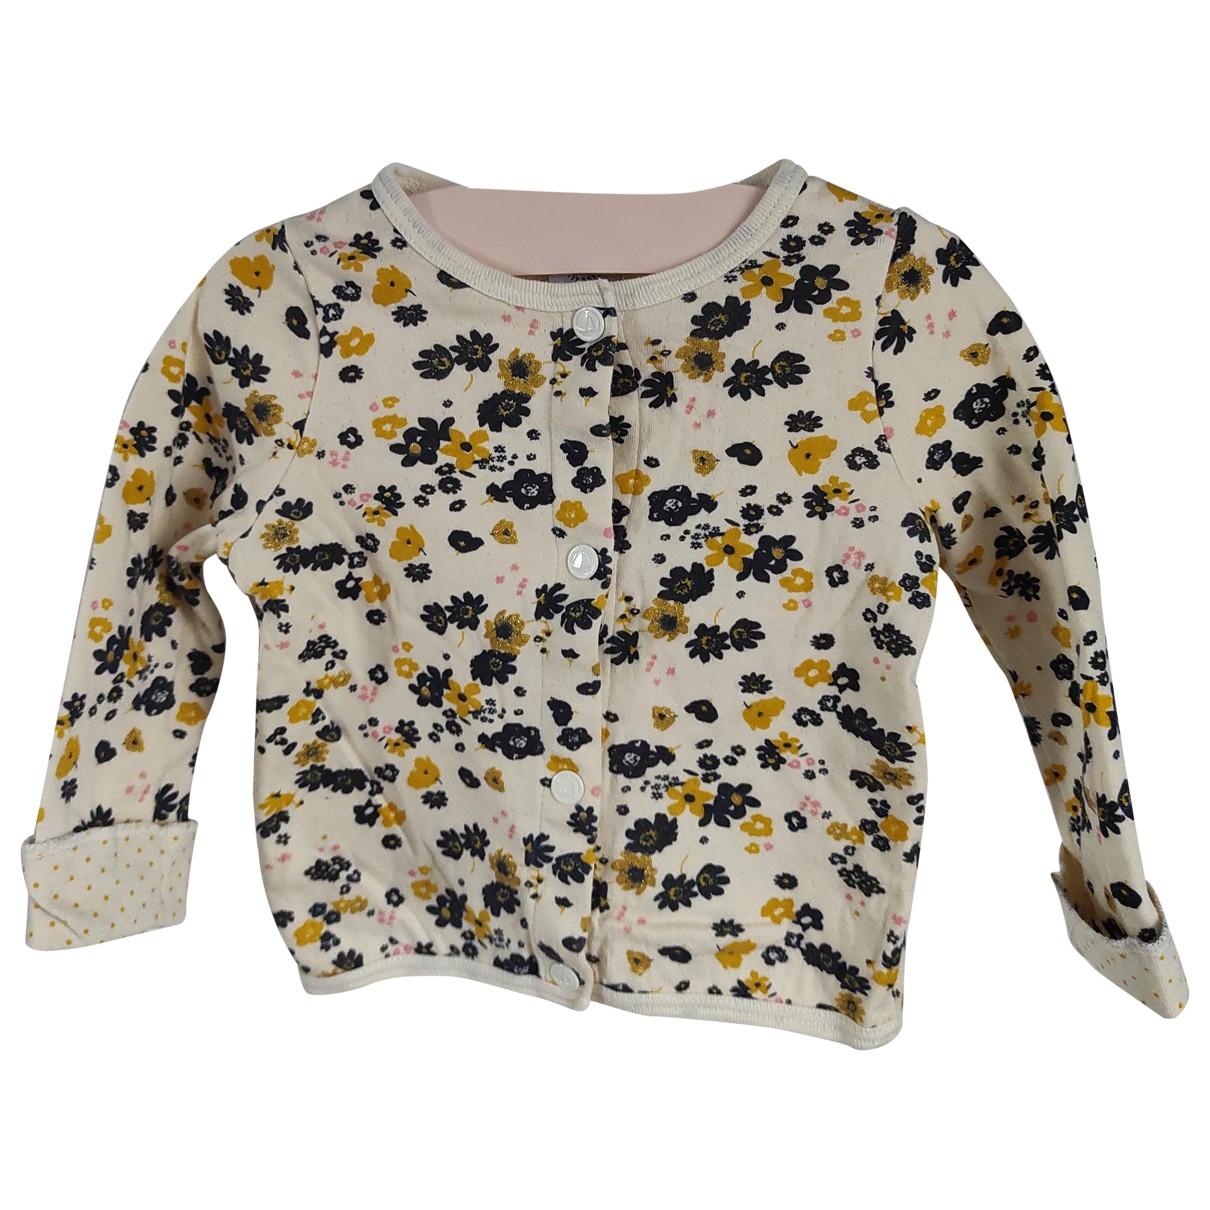 Petit Bateau N Beige Cotton Knitwear for Kids 12 months - up to 74cm FR